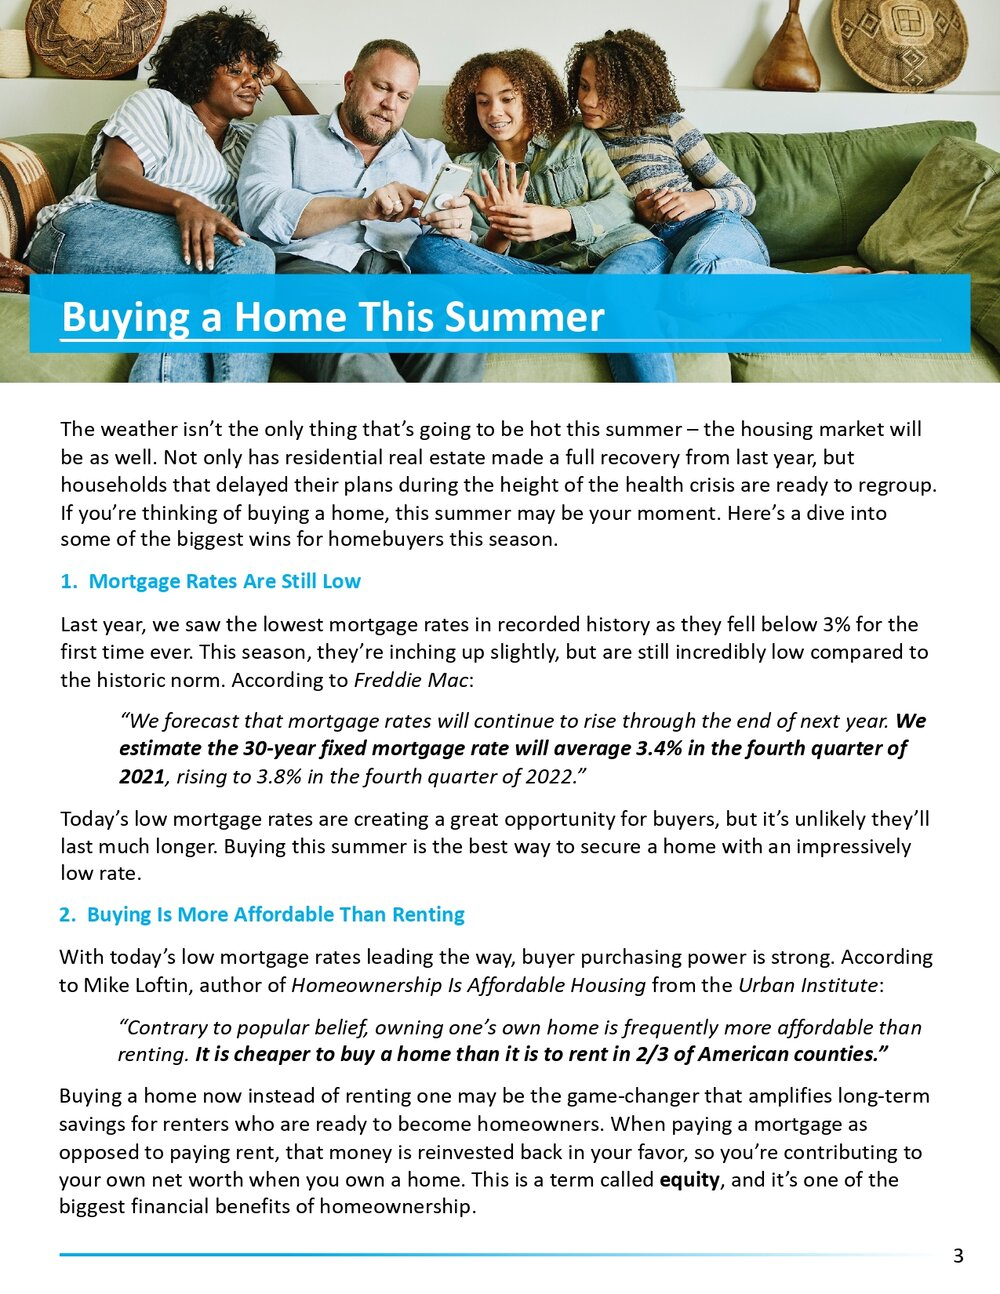 BuyingaHomeSummer2021_page-0003.jpg